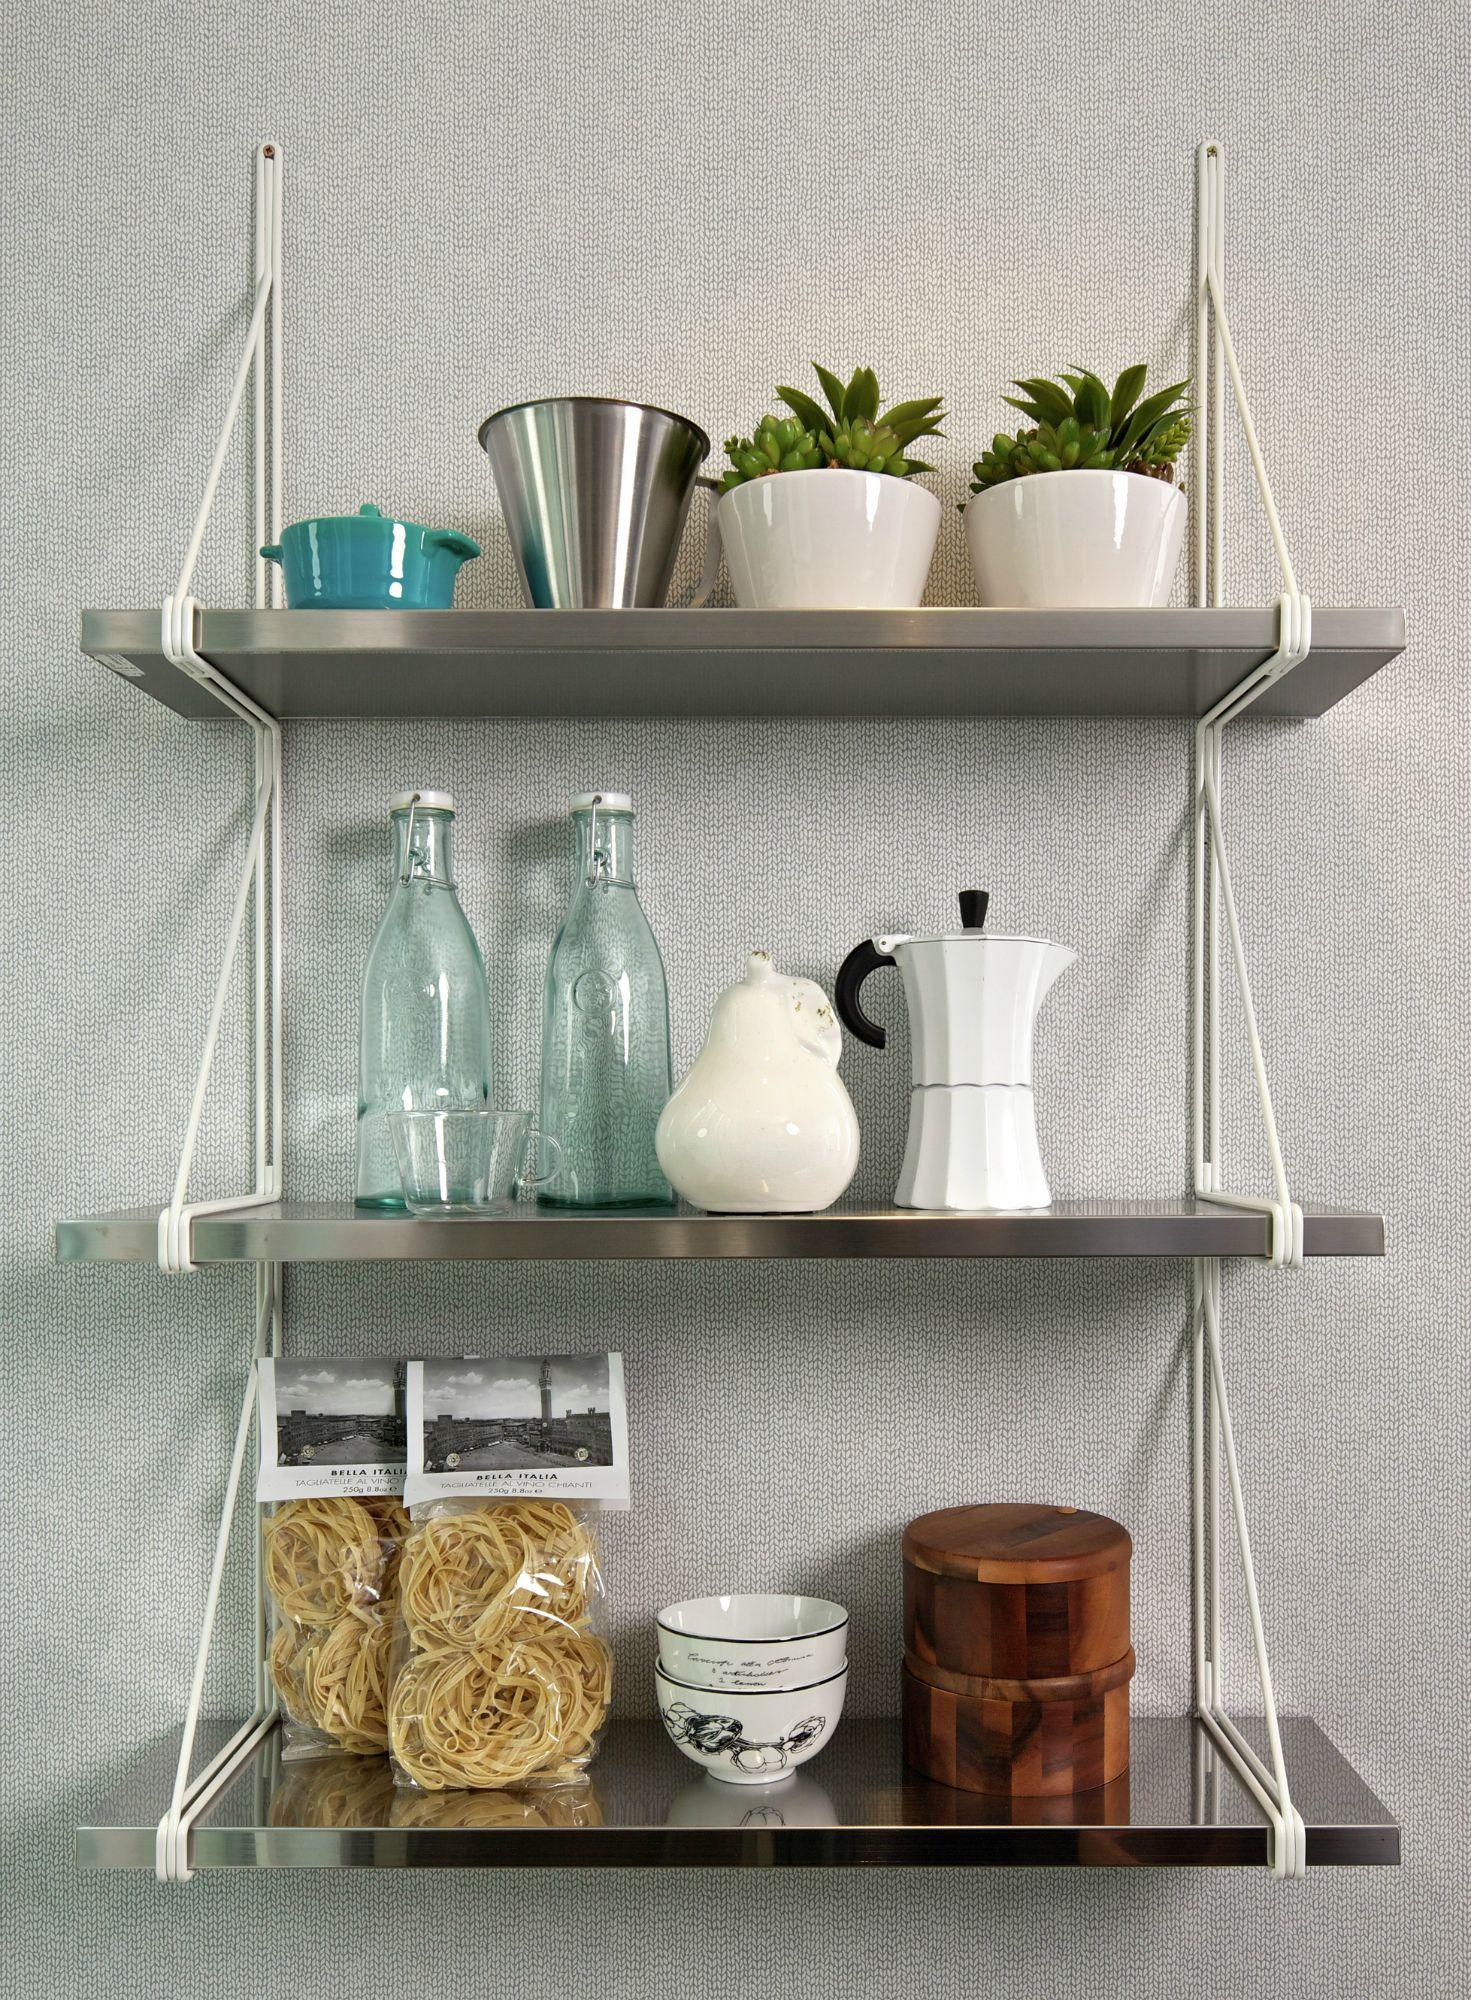 Suna Interior Design The Filaments Kitchen Wall Mounted